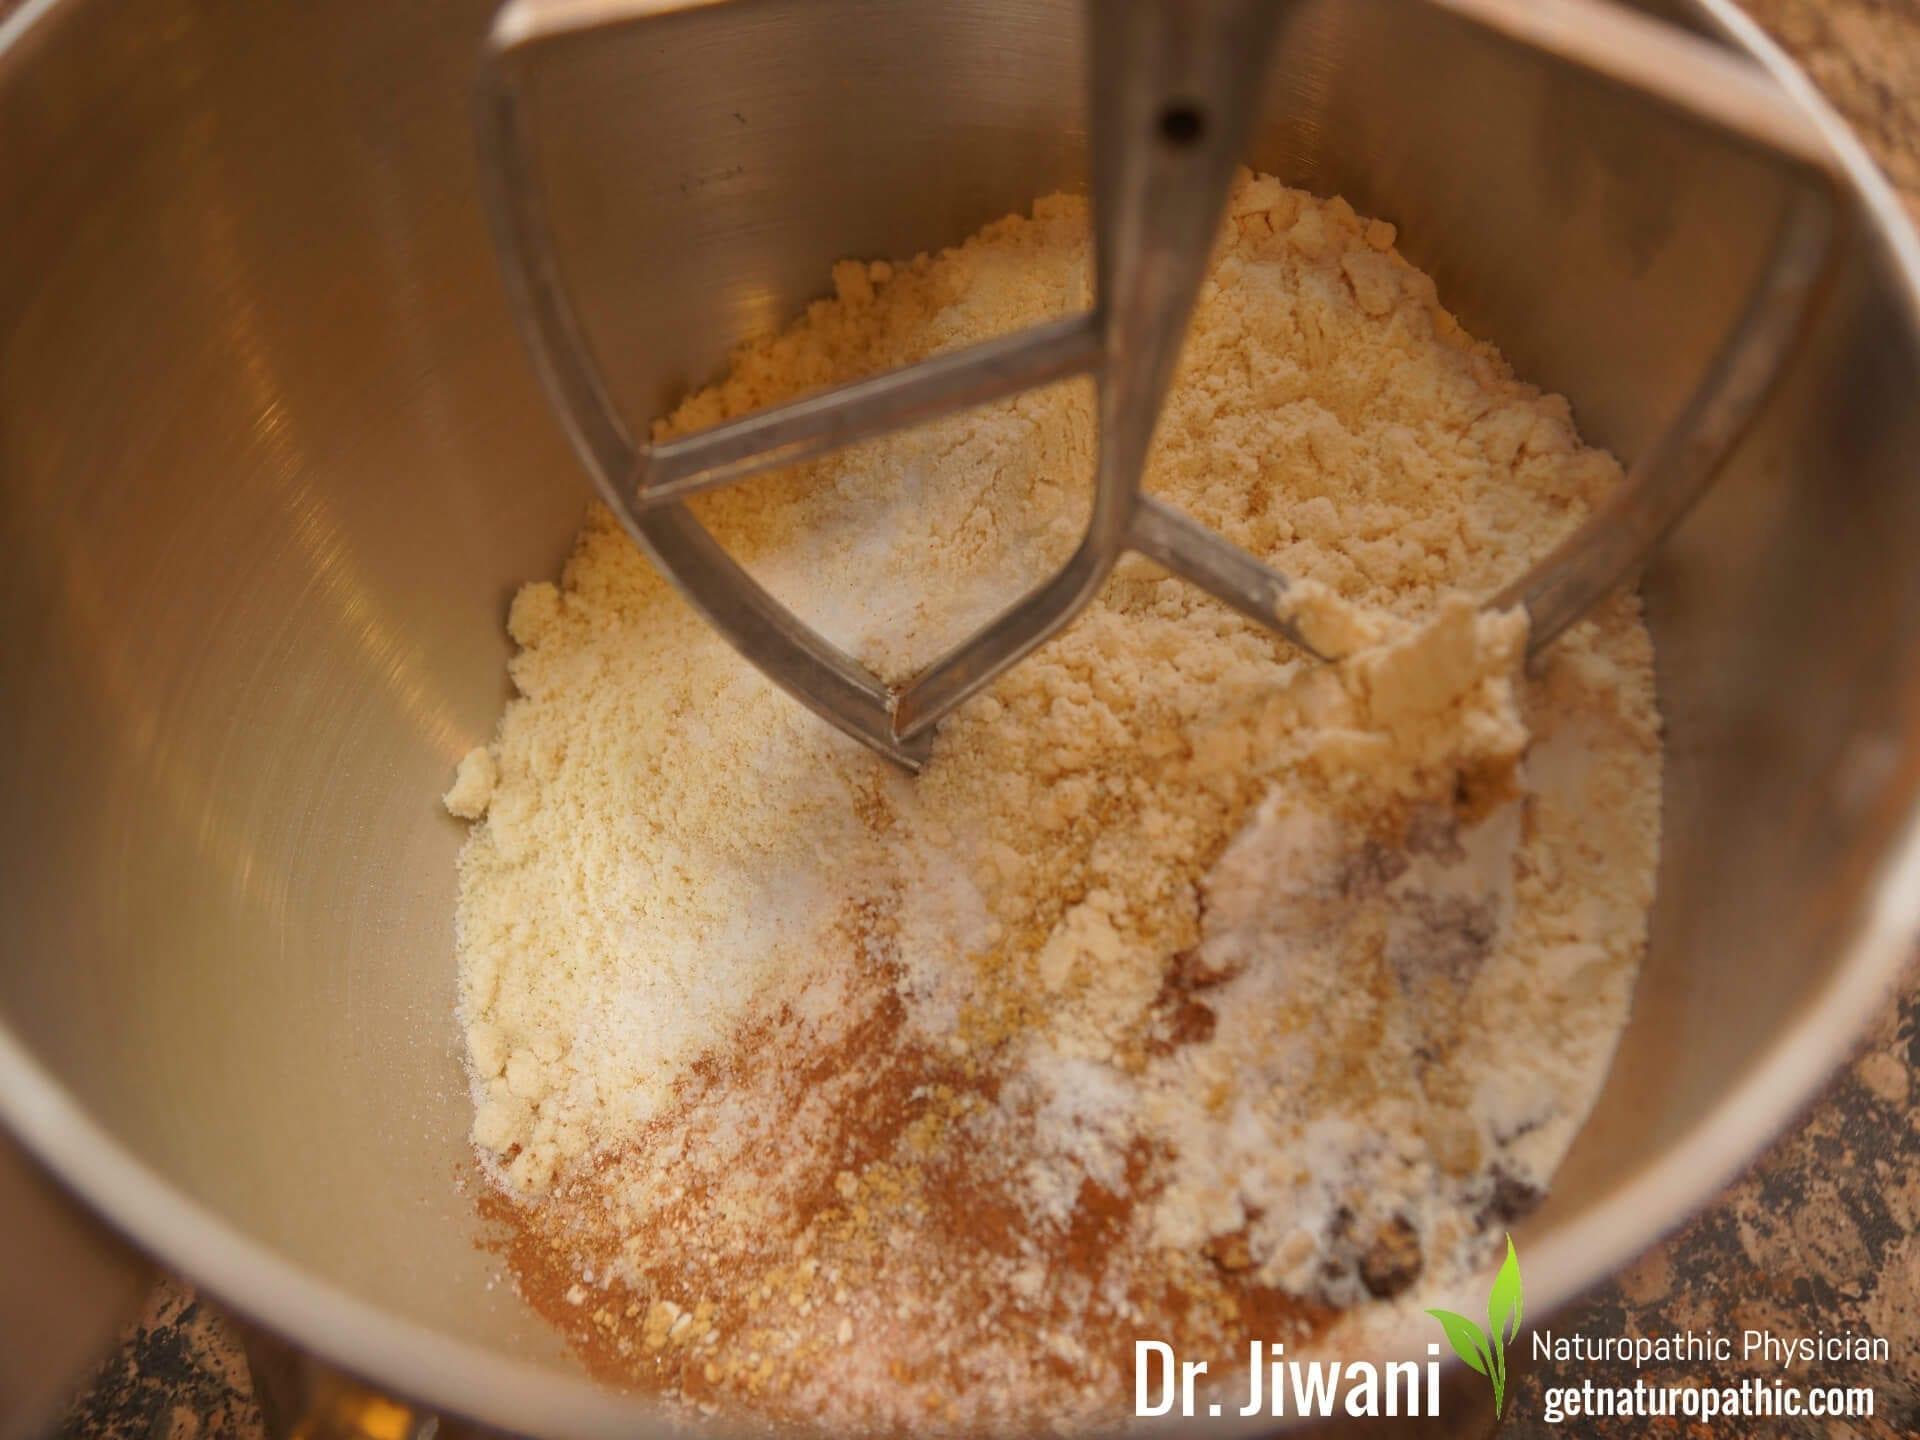 Dr.Jiwani's Paleo Vegan Grain-Free Gingerbread Cookies Recipe: Gluten-Free, Egg-Free, Dairy-Free, Soy-Free, Sugar-Free, Corn-Free, Ideal For Diabetic, Paleo, Keto, Vegan & Candida Diets | Dr. Jiwani's Naturopathic Nuggets Blog